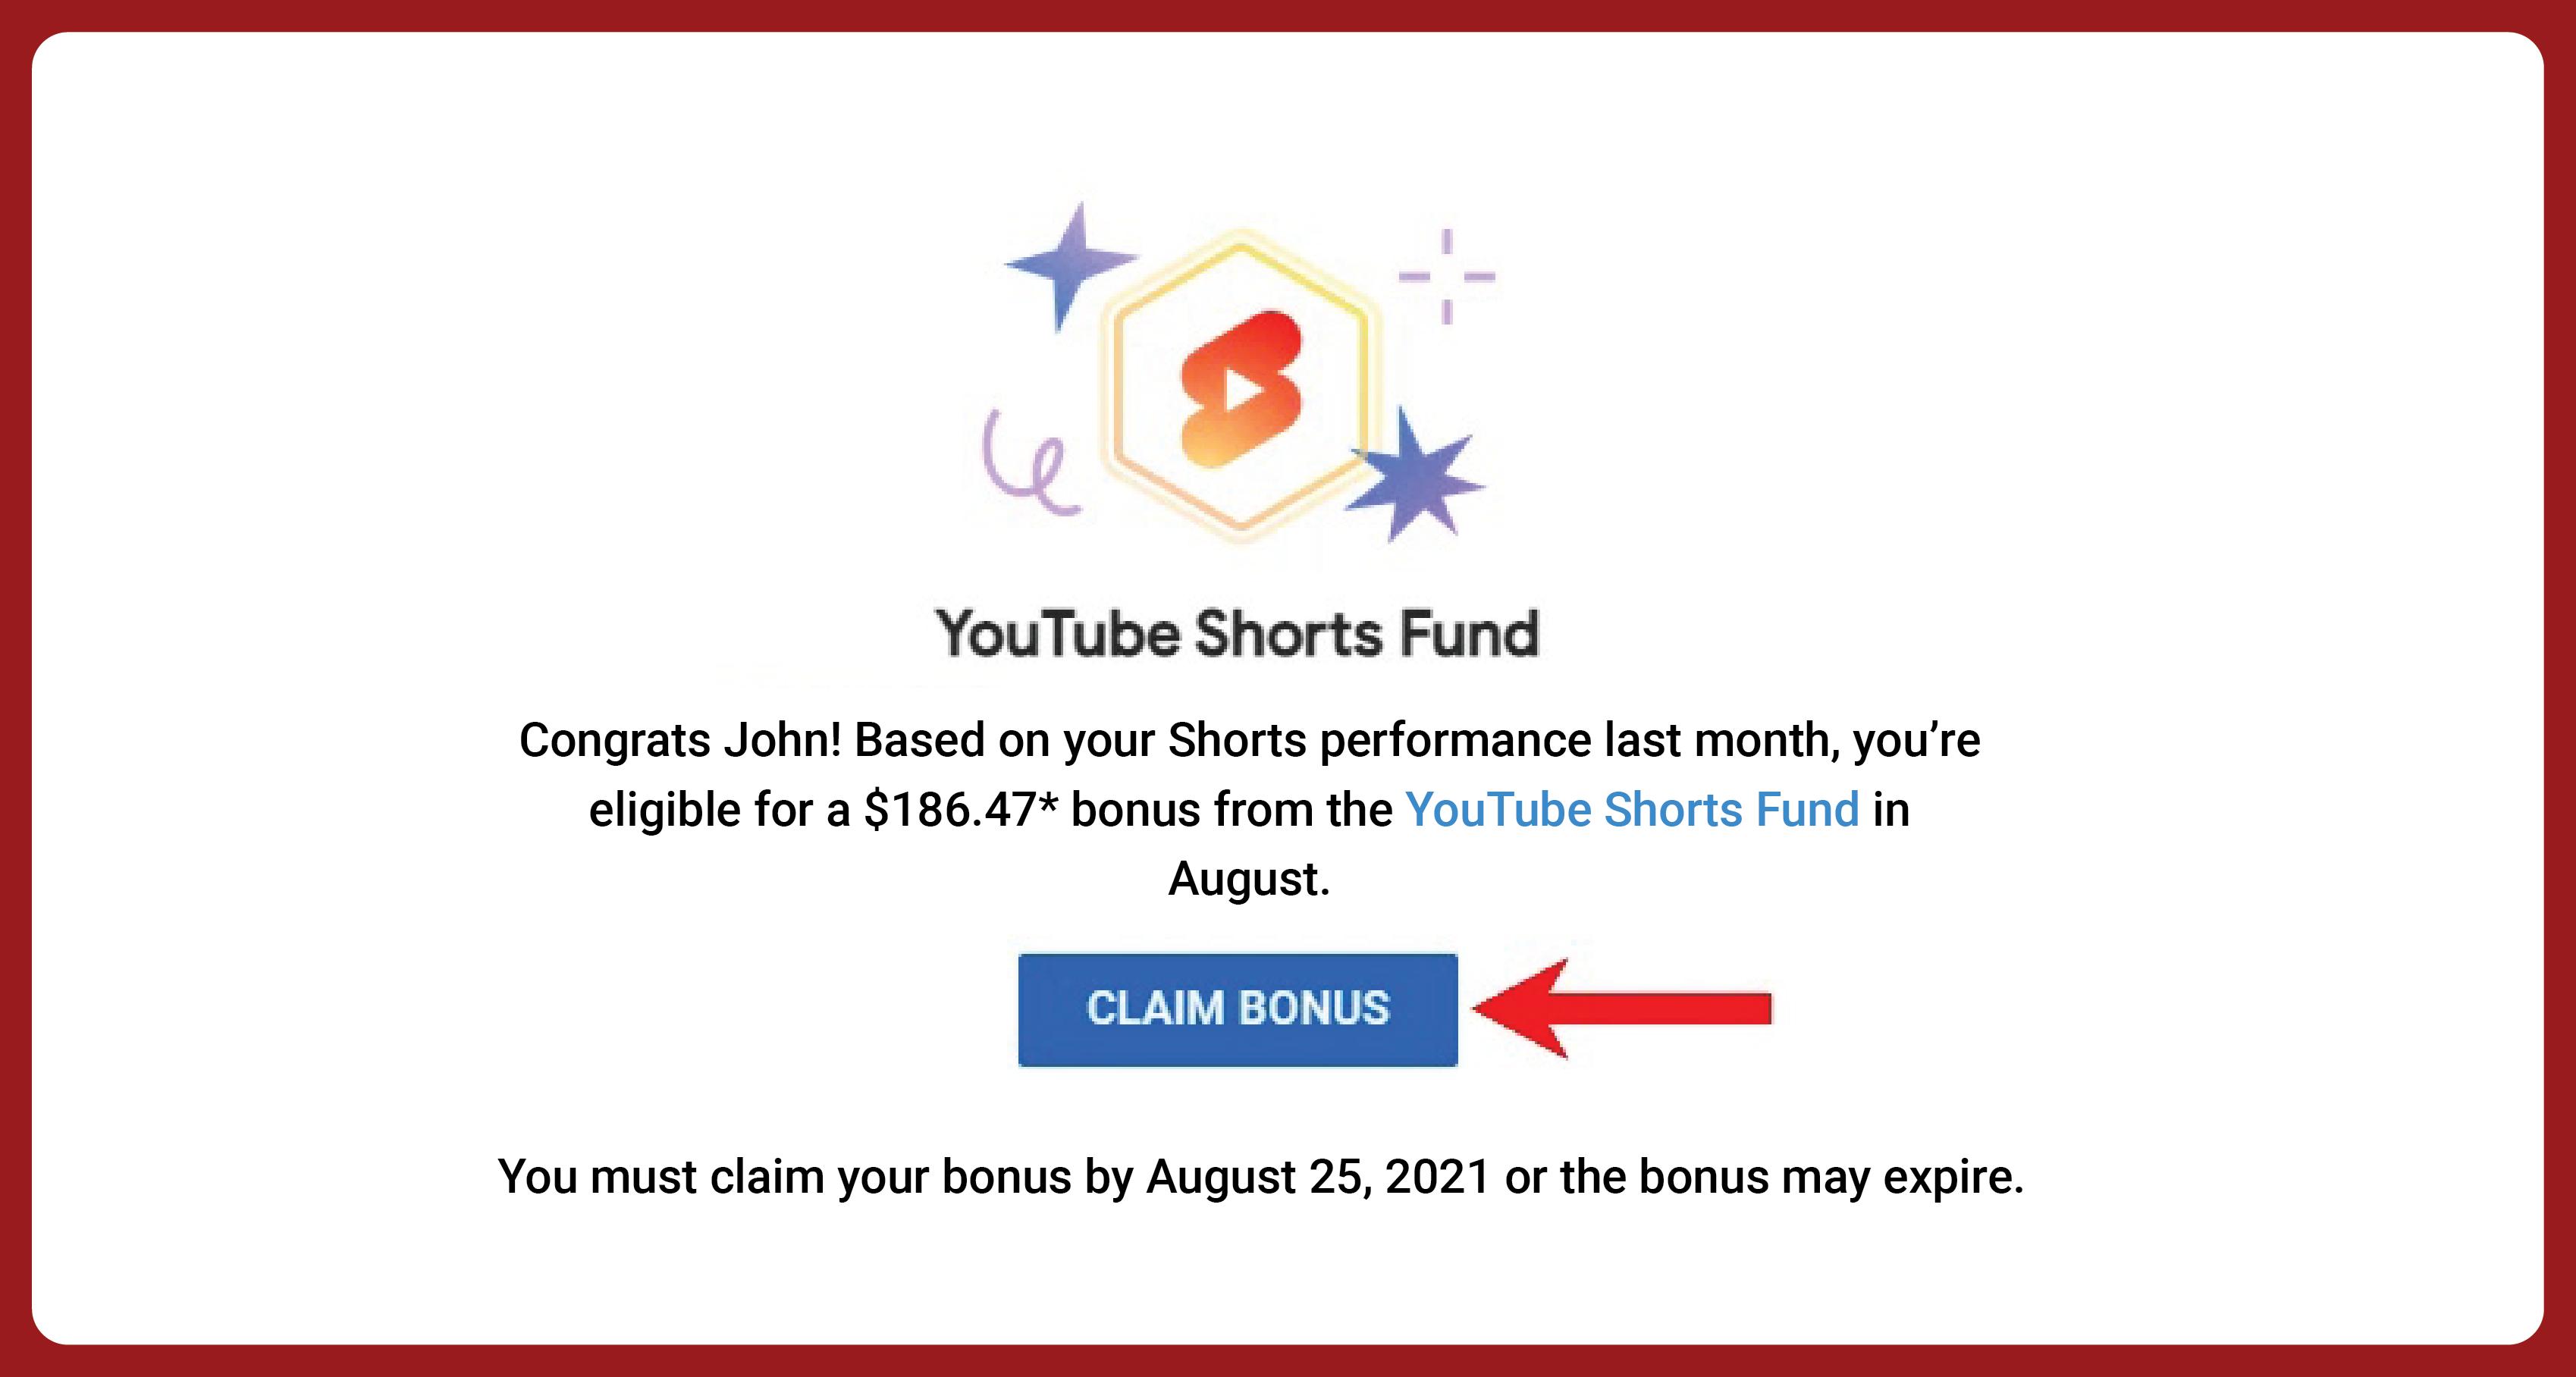 YouTube Shorts claim bonus page